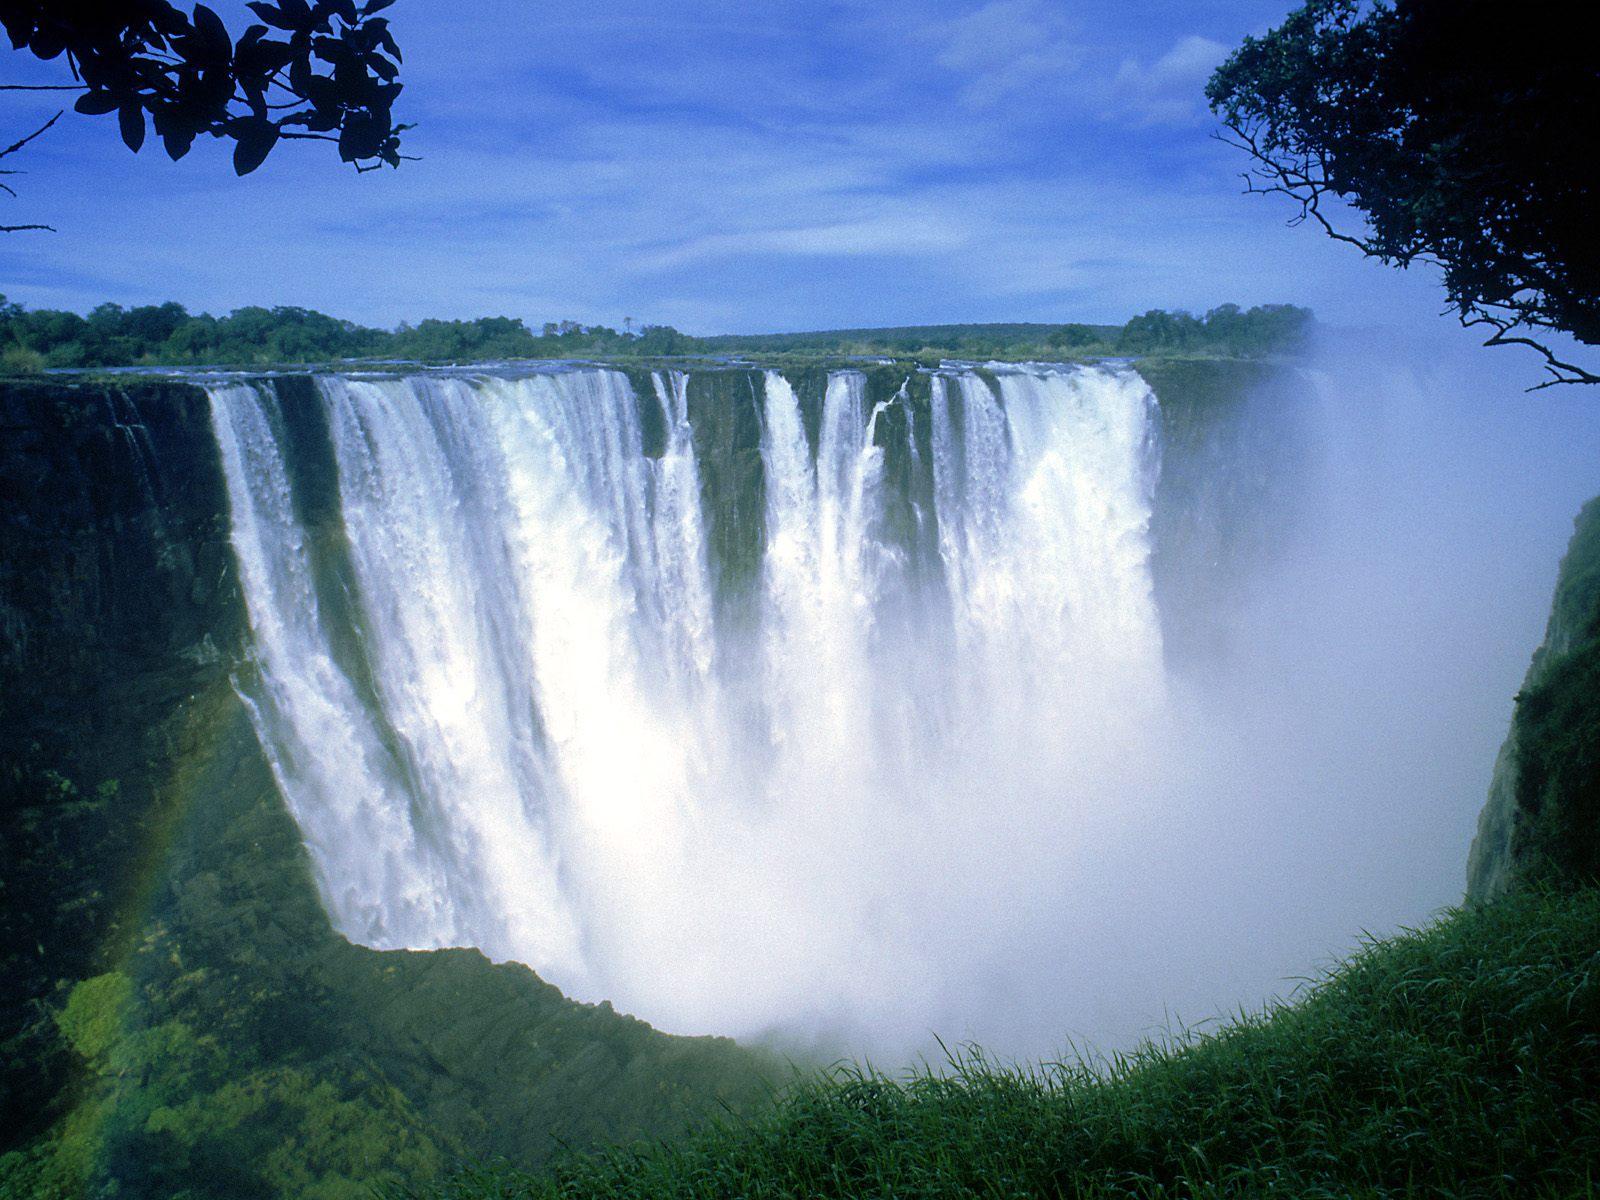 http://3.bp.blogspot.com/_FQx4JXMzHVQ/TMcmGcApdeI/AAAAAAAAB5M/ujqBPiC2uYg/s1600/Victoria_Falls%252C_Zimbabwe%252C_Africa.jpg